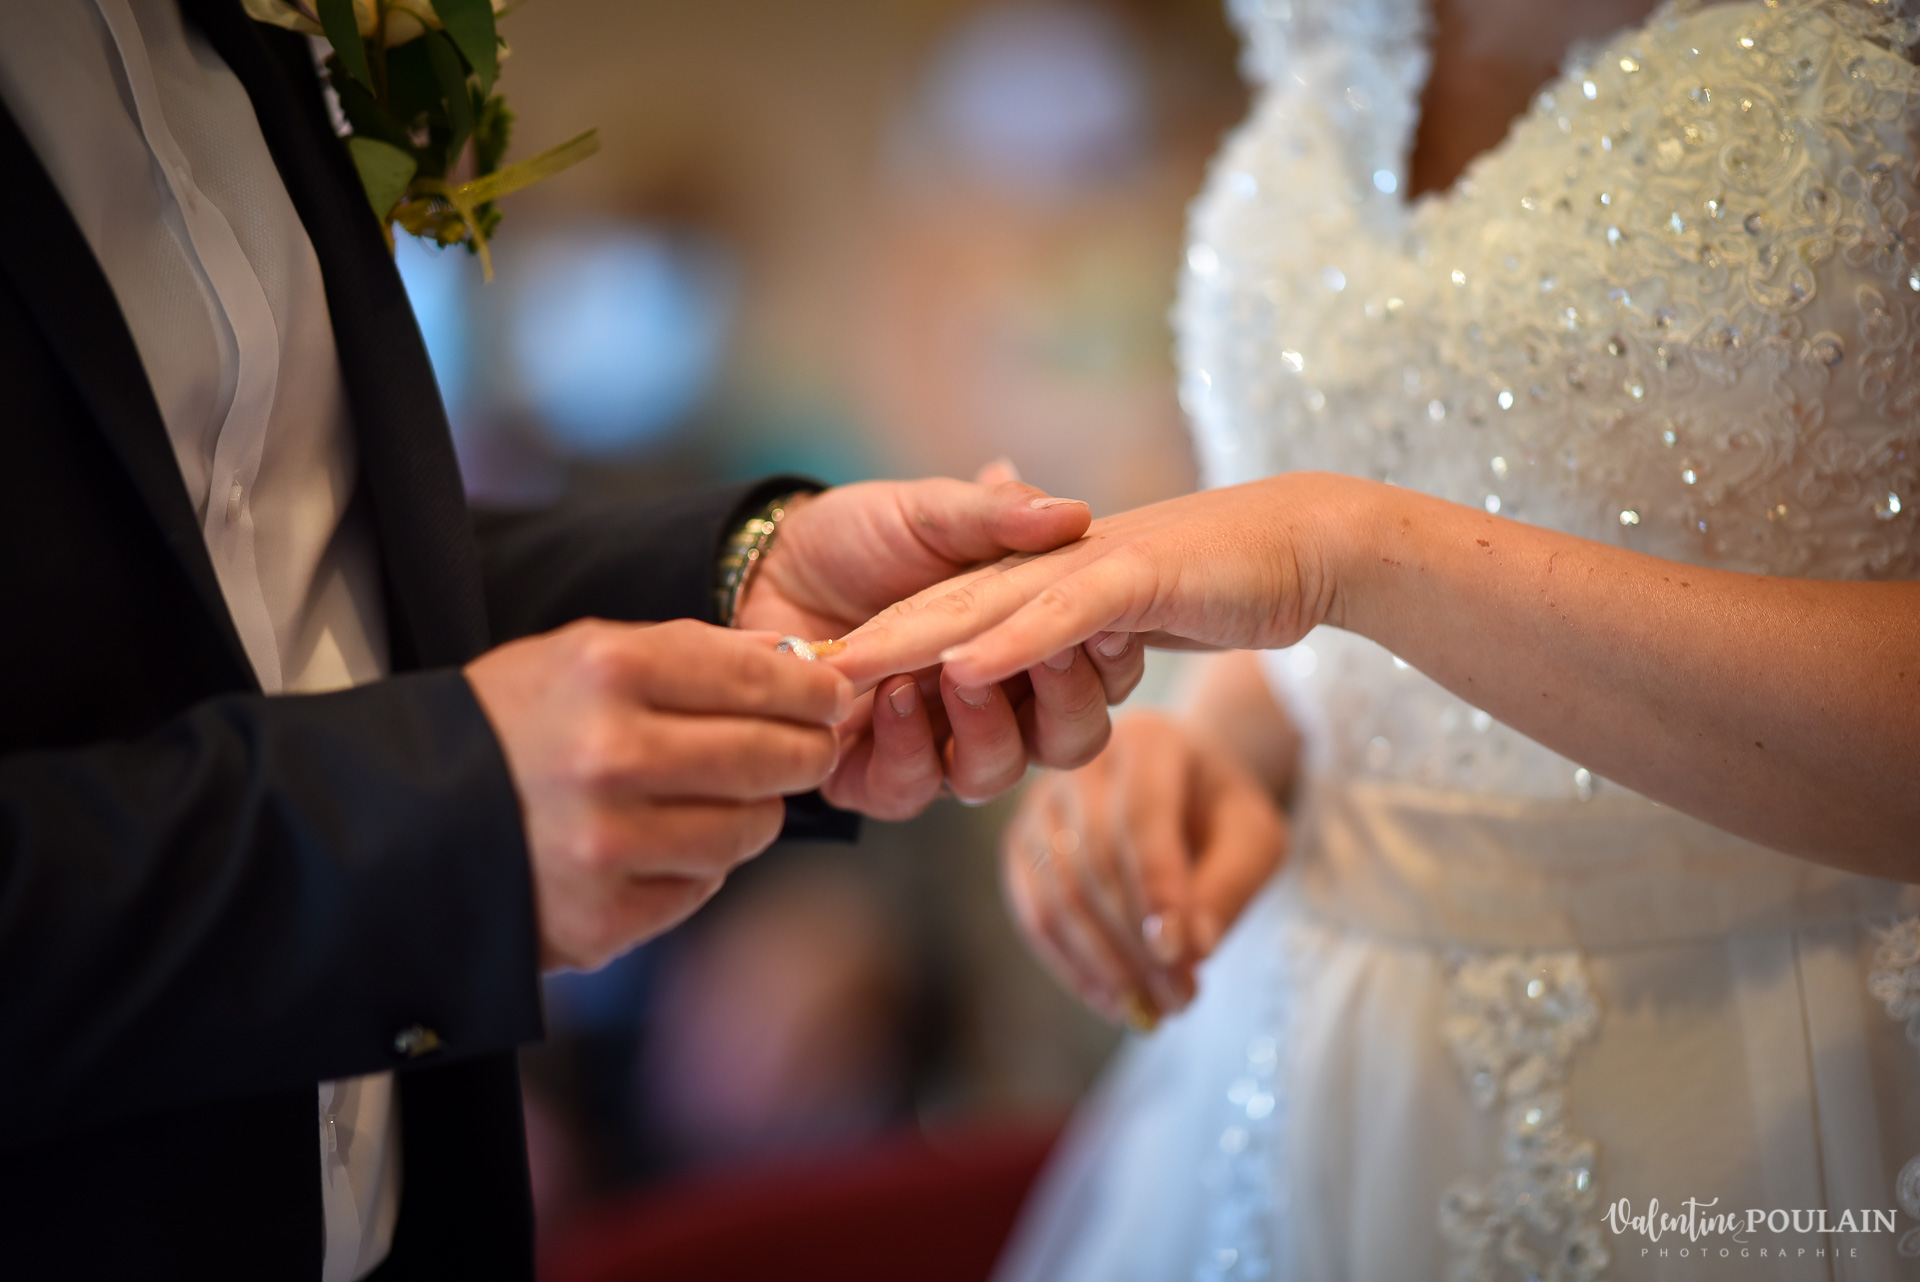 Mariage fun kermesse party - Valentine Poulain alliance